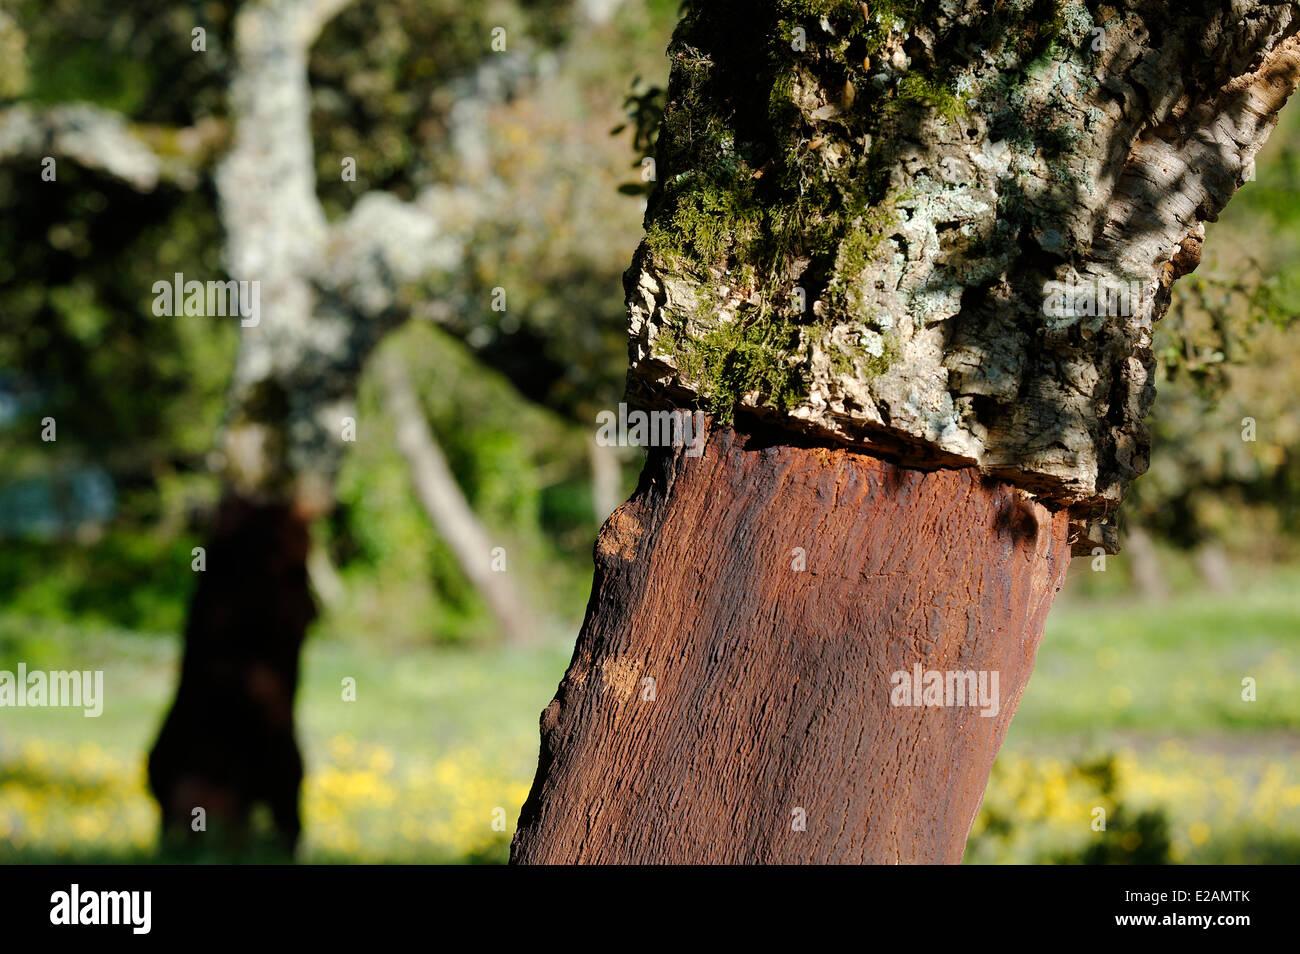 Italie, Sardaigne, Olbia Tempio Province, Aggius, écorce de chêne liège dont l'exploitation est Photo Stock